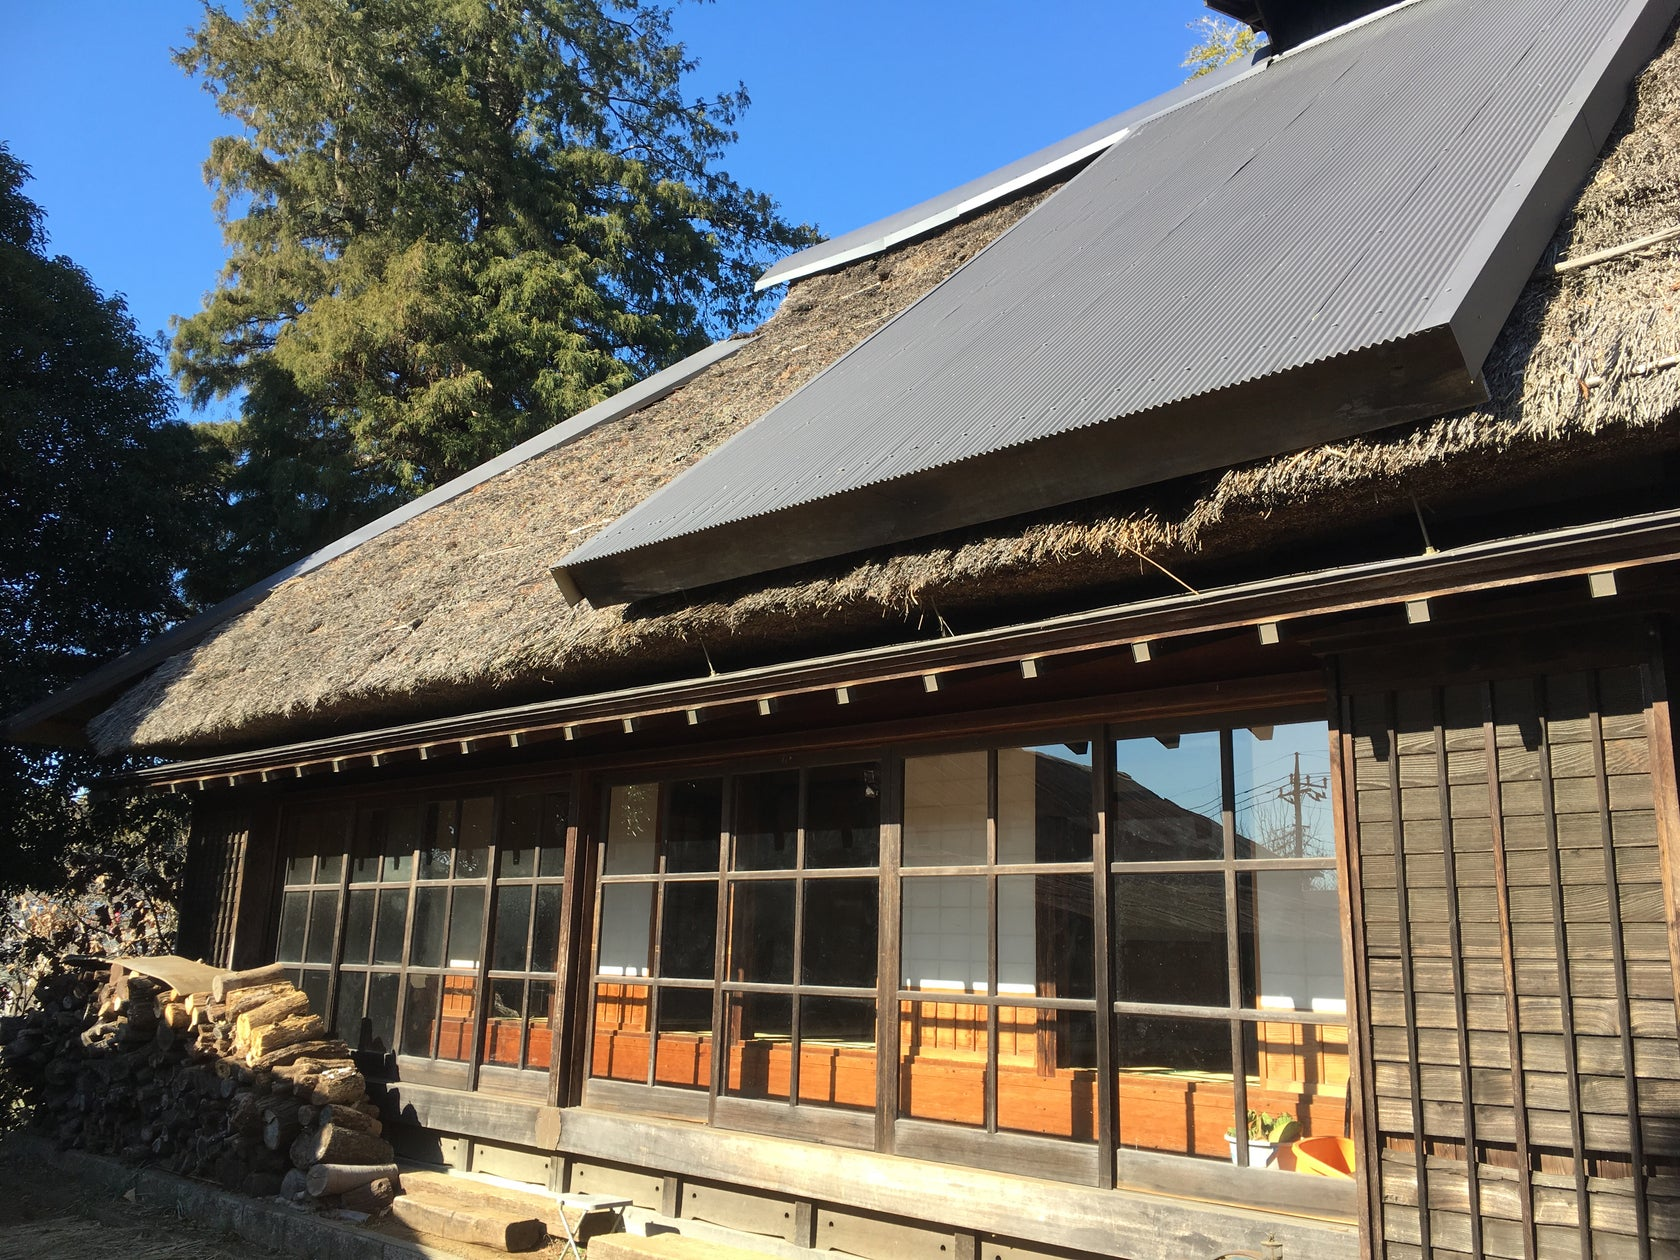 Osmo Pocketが使える!【東京 町田】築153年の茅葺き古民家で、春のお花、新緑と戯れよう!写真撮影スポット多数。